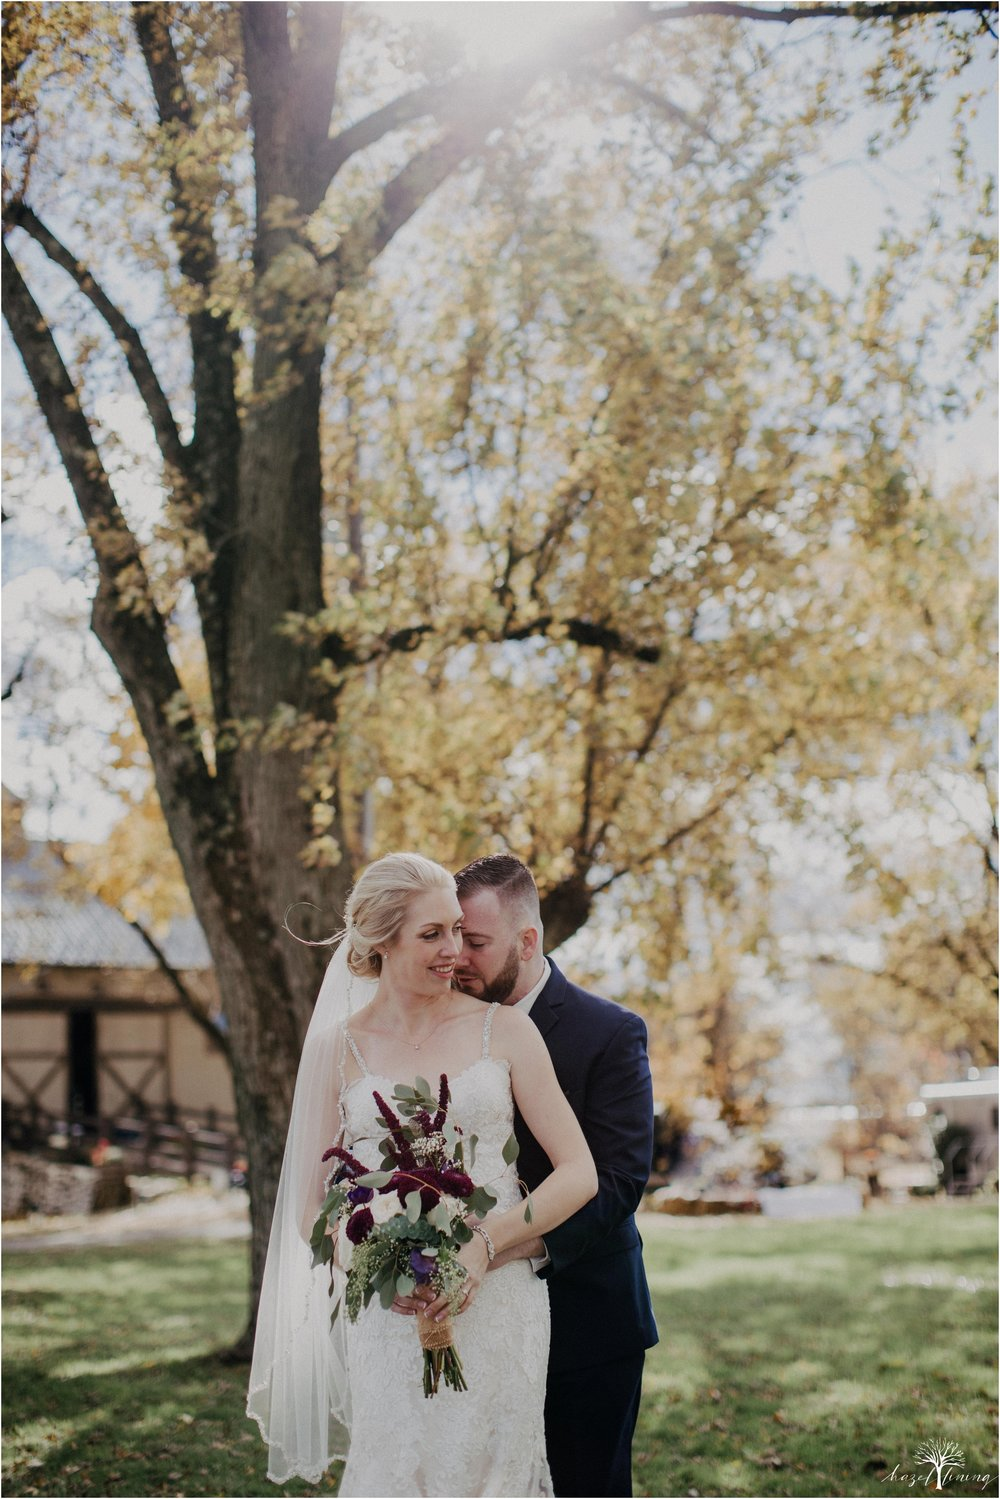 briana-krans-greg-johnston-farm-bakery-and-events-fall-wedding_0034.jpg